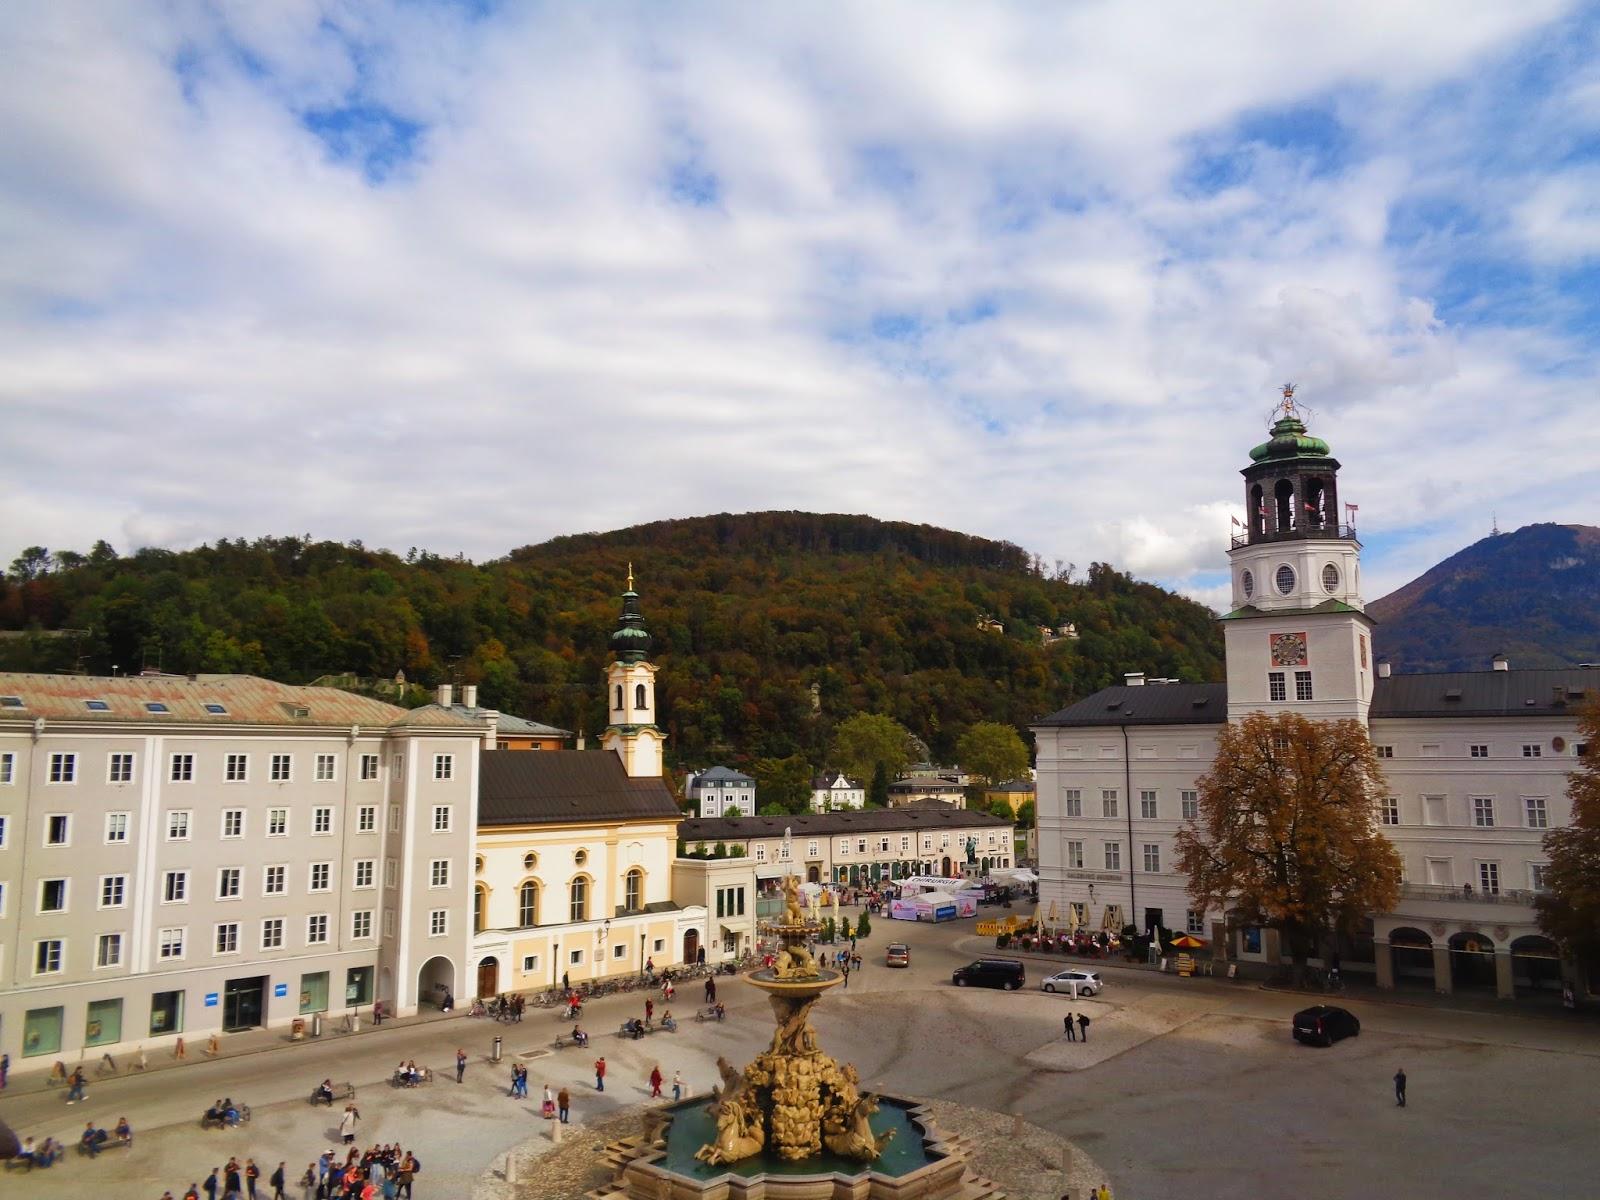 5 Things to Do in Salzburg, Austria - Photo diary